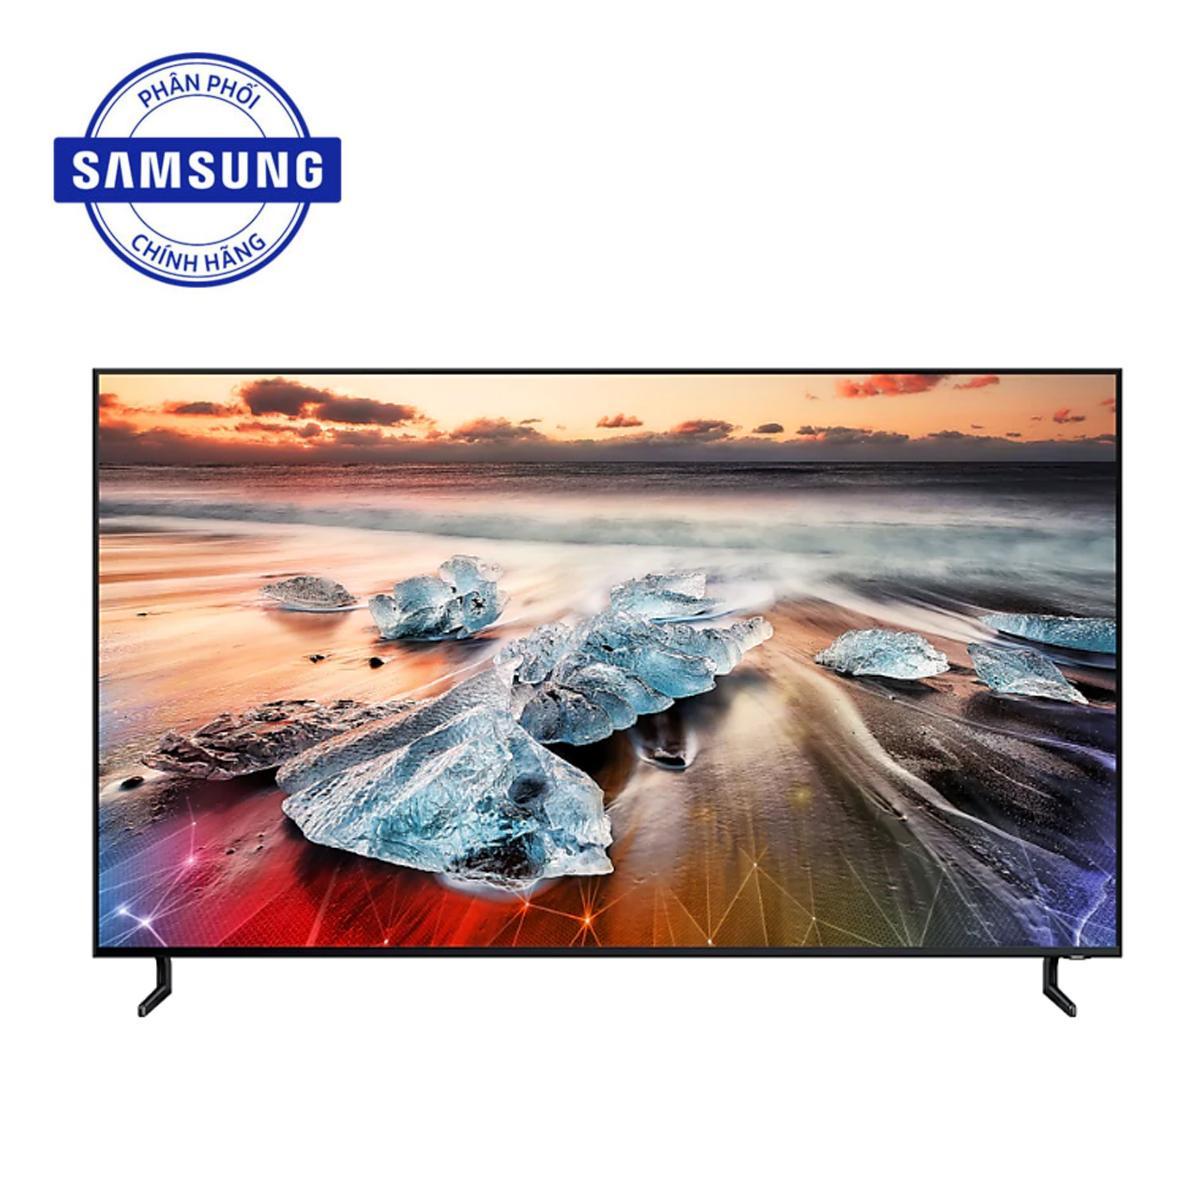 Smart TV 8K QLED 82 inch Q900R 2019